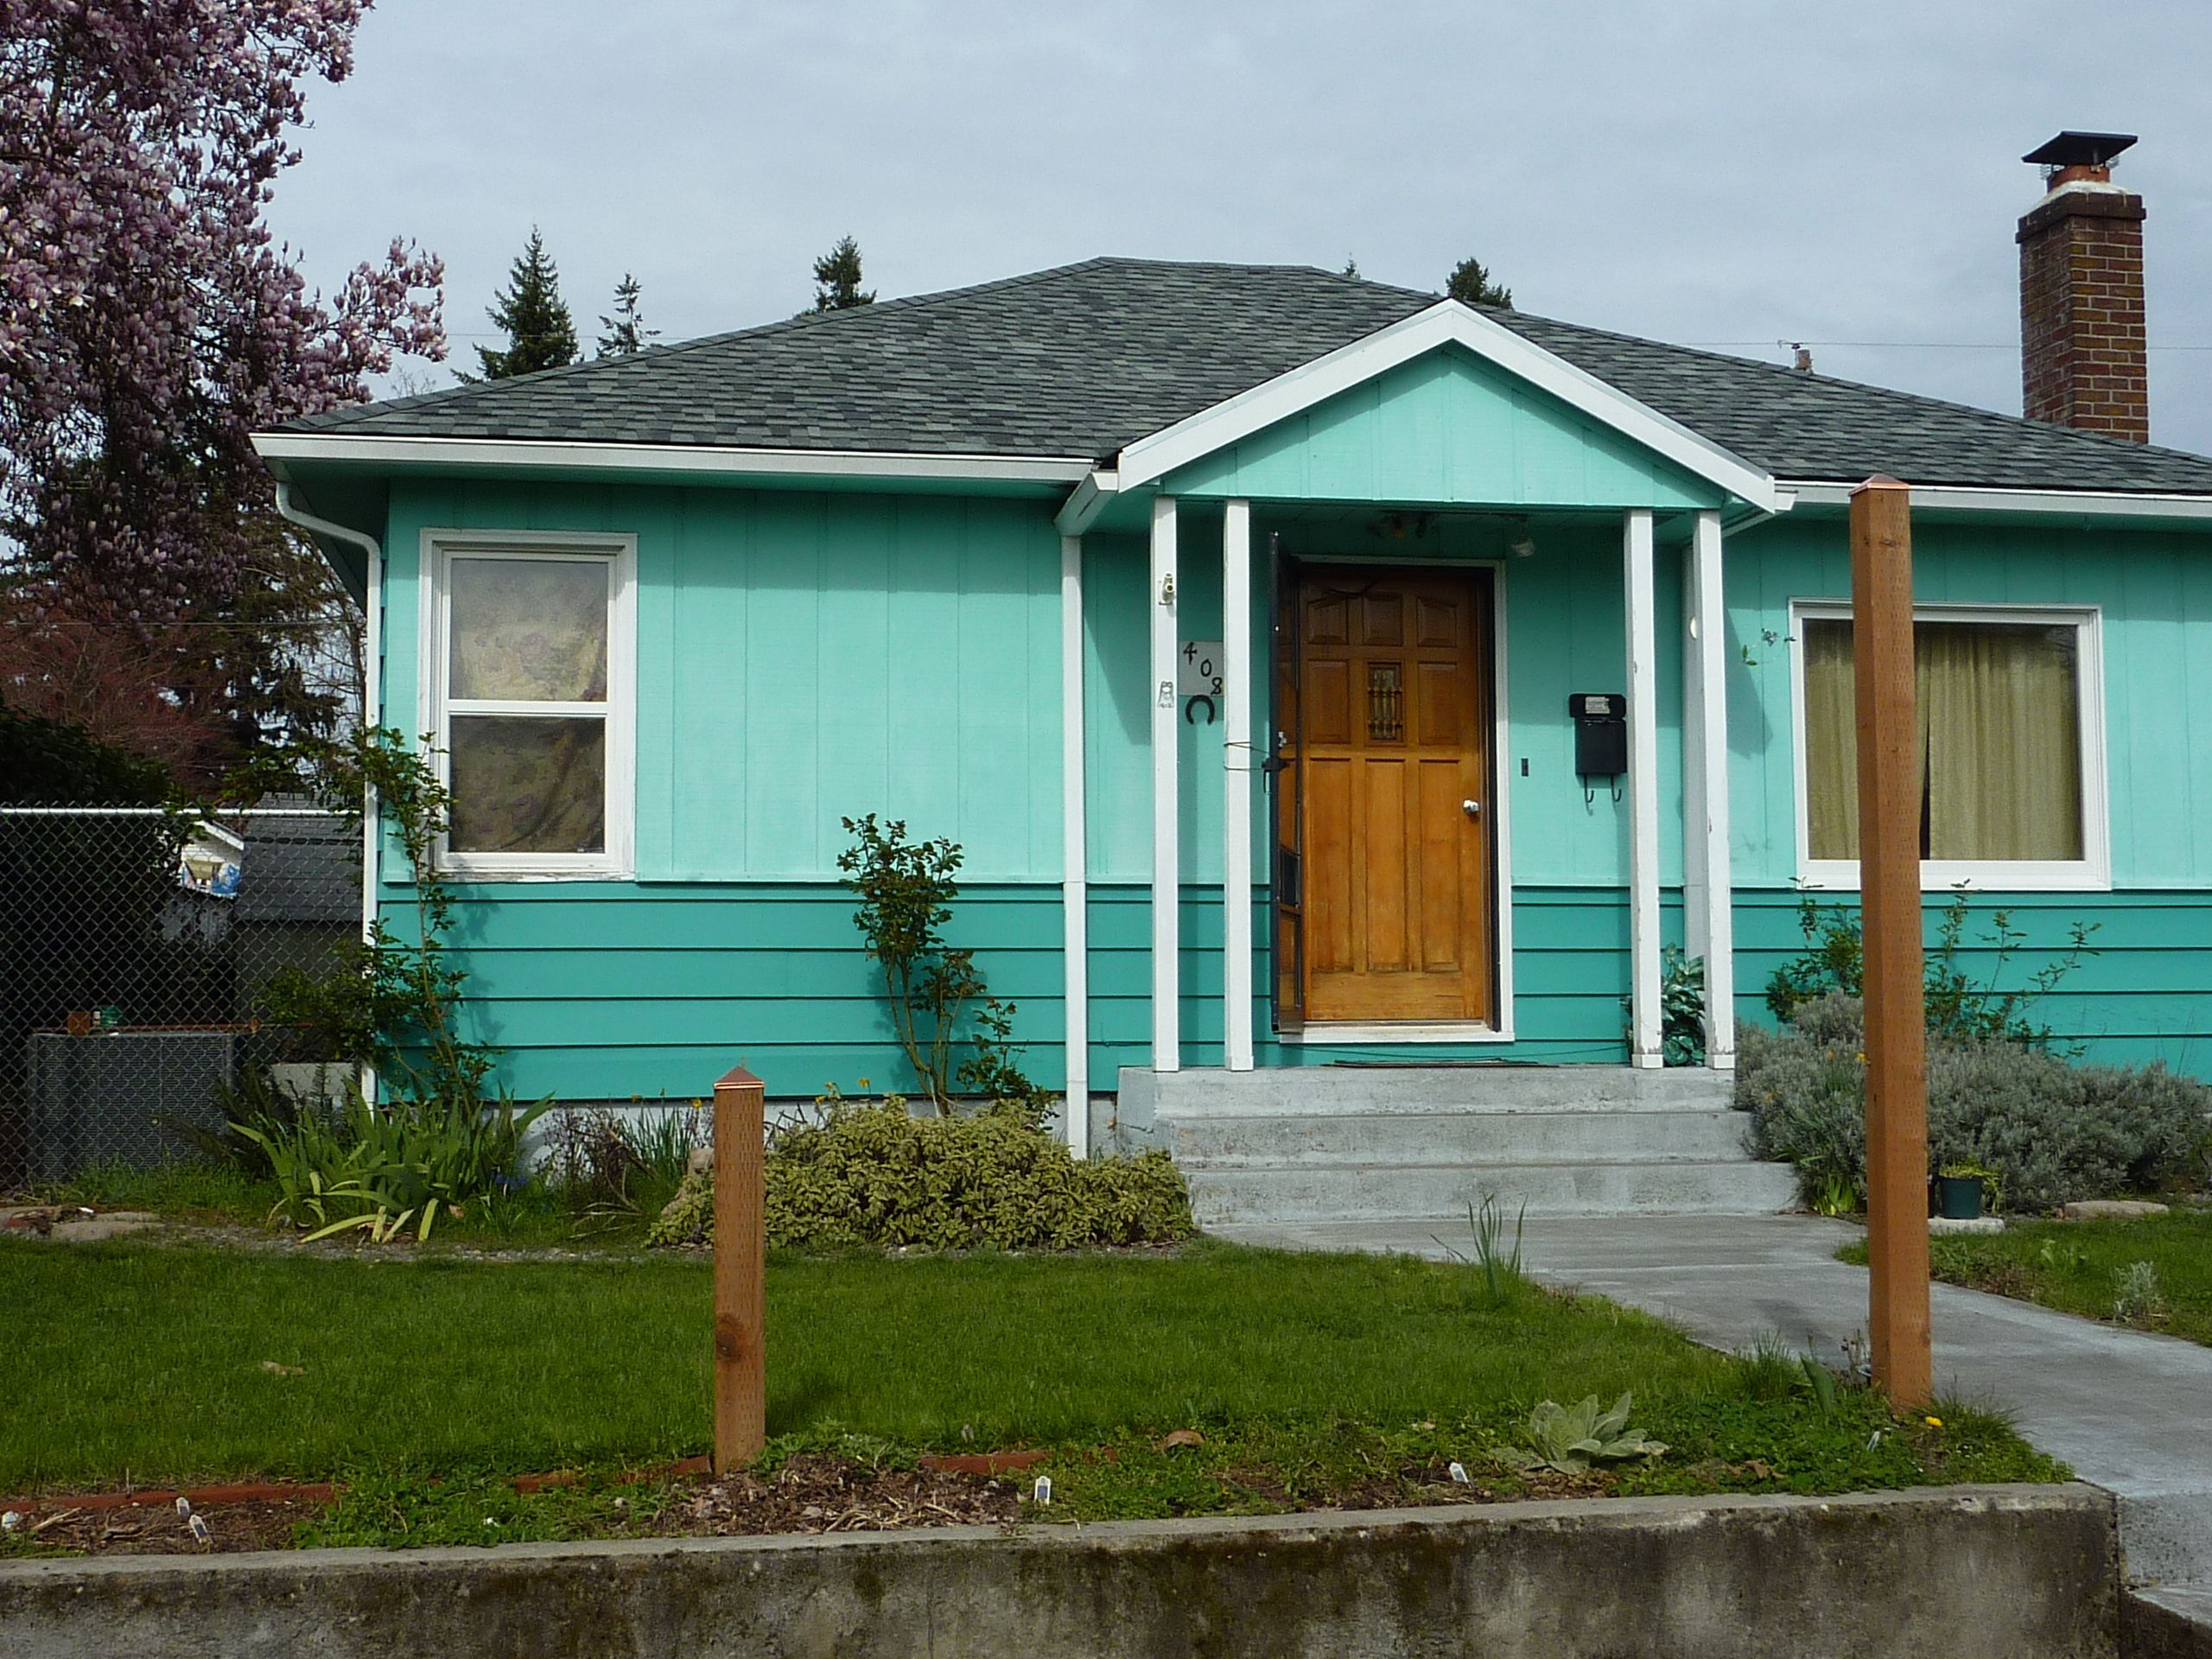 Exterior Paint Google Search Modern Farmhouse Exterior Exterior Paint Colors For House House Exterior